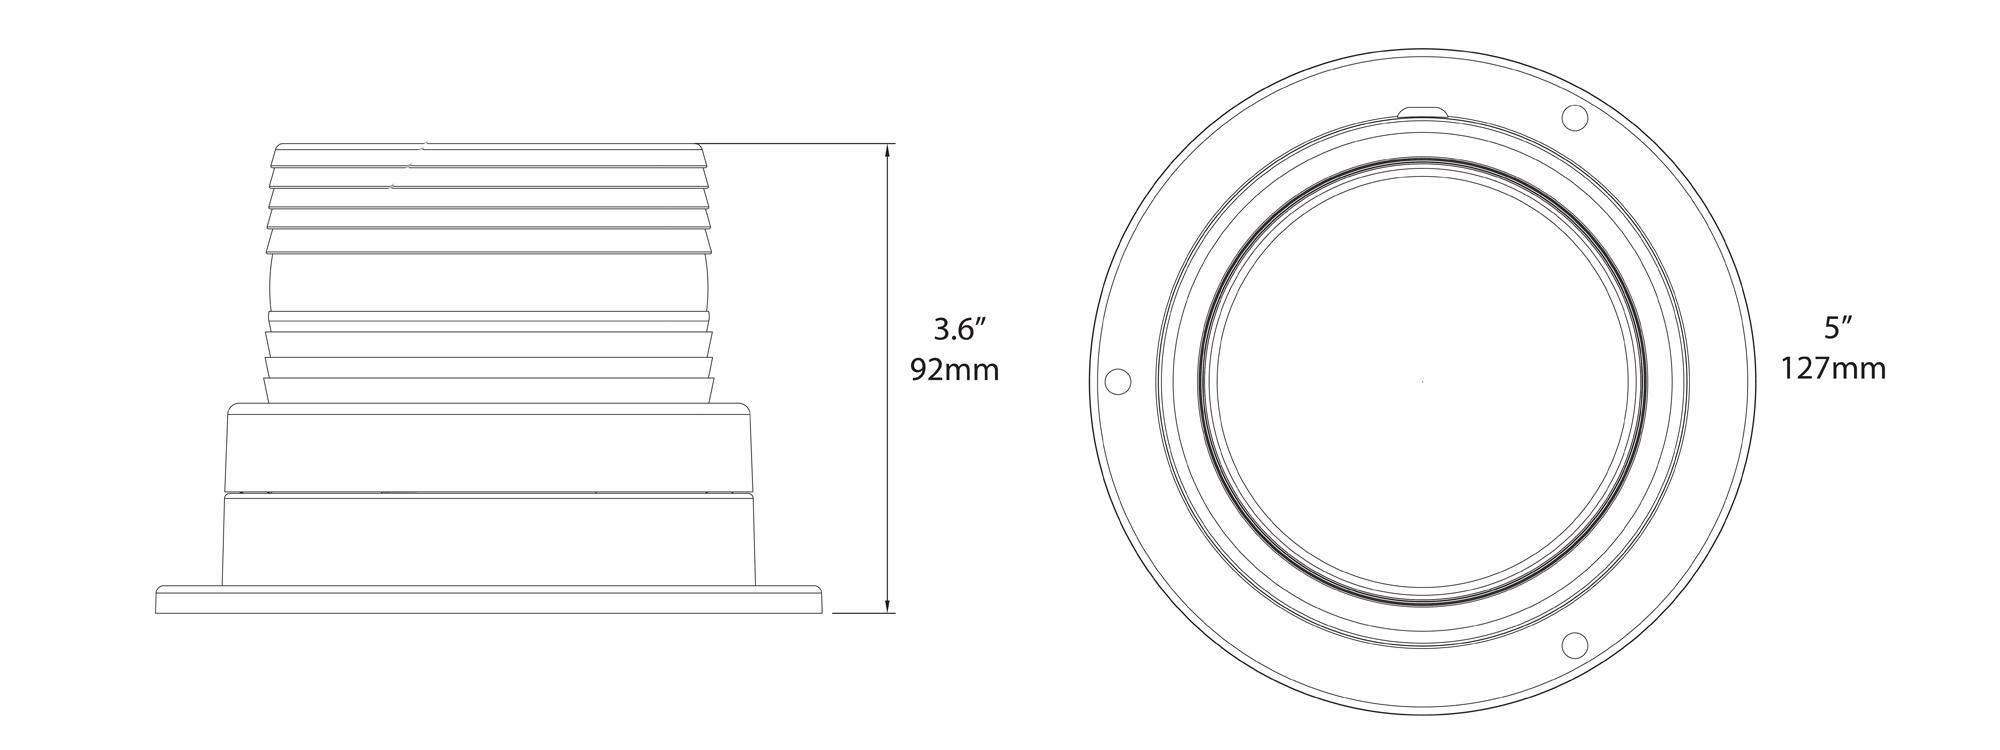 C48aw Warning Fog Driving Products Blazer International Led Strobe Schematic Light